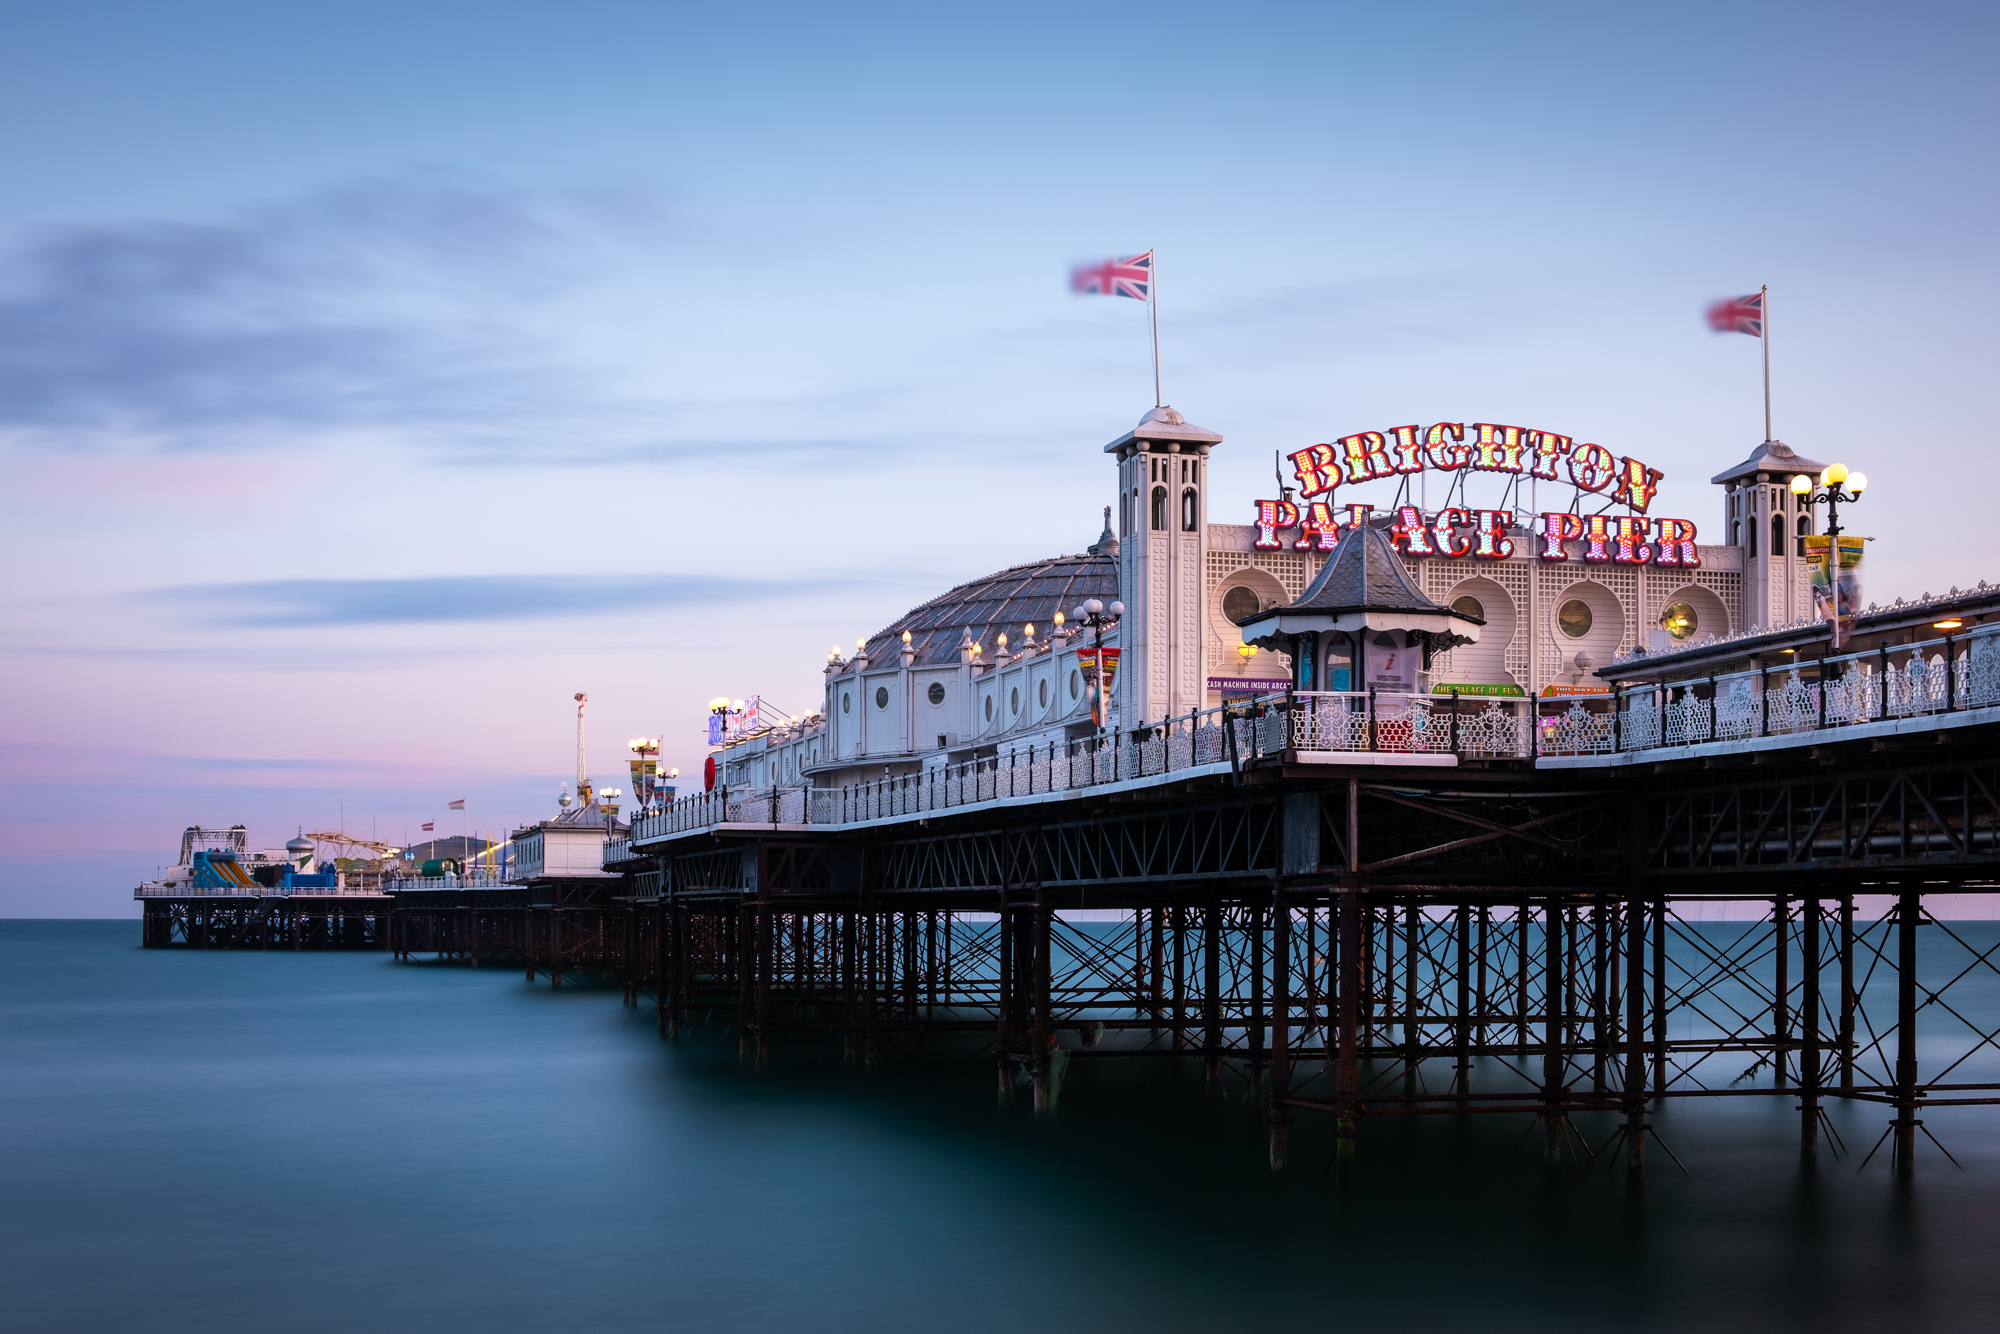 Palace Pier | Fujifilm XT2 | XF18-55mm | 28mm | 181 seconds | f/9 | ISO200